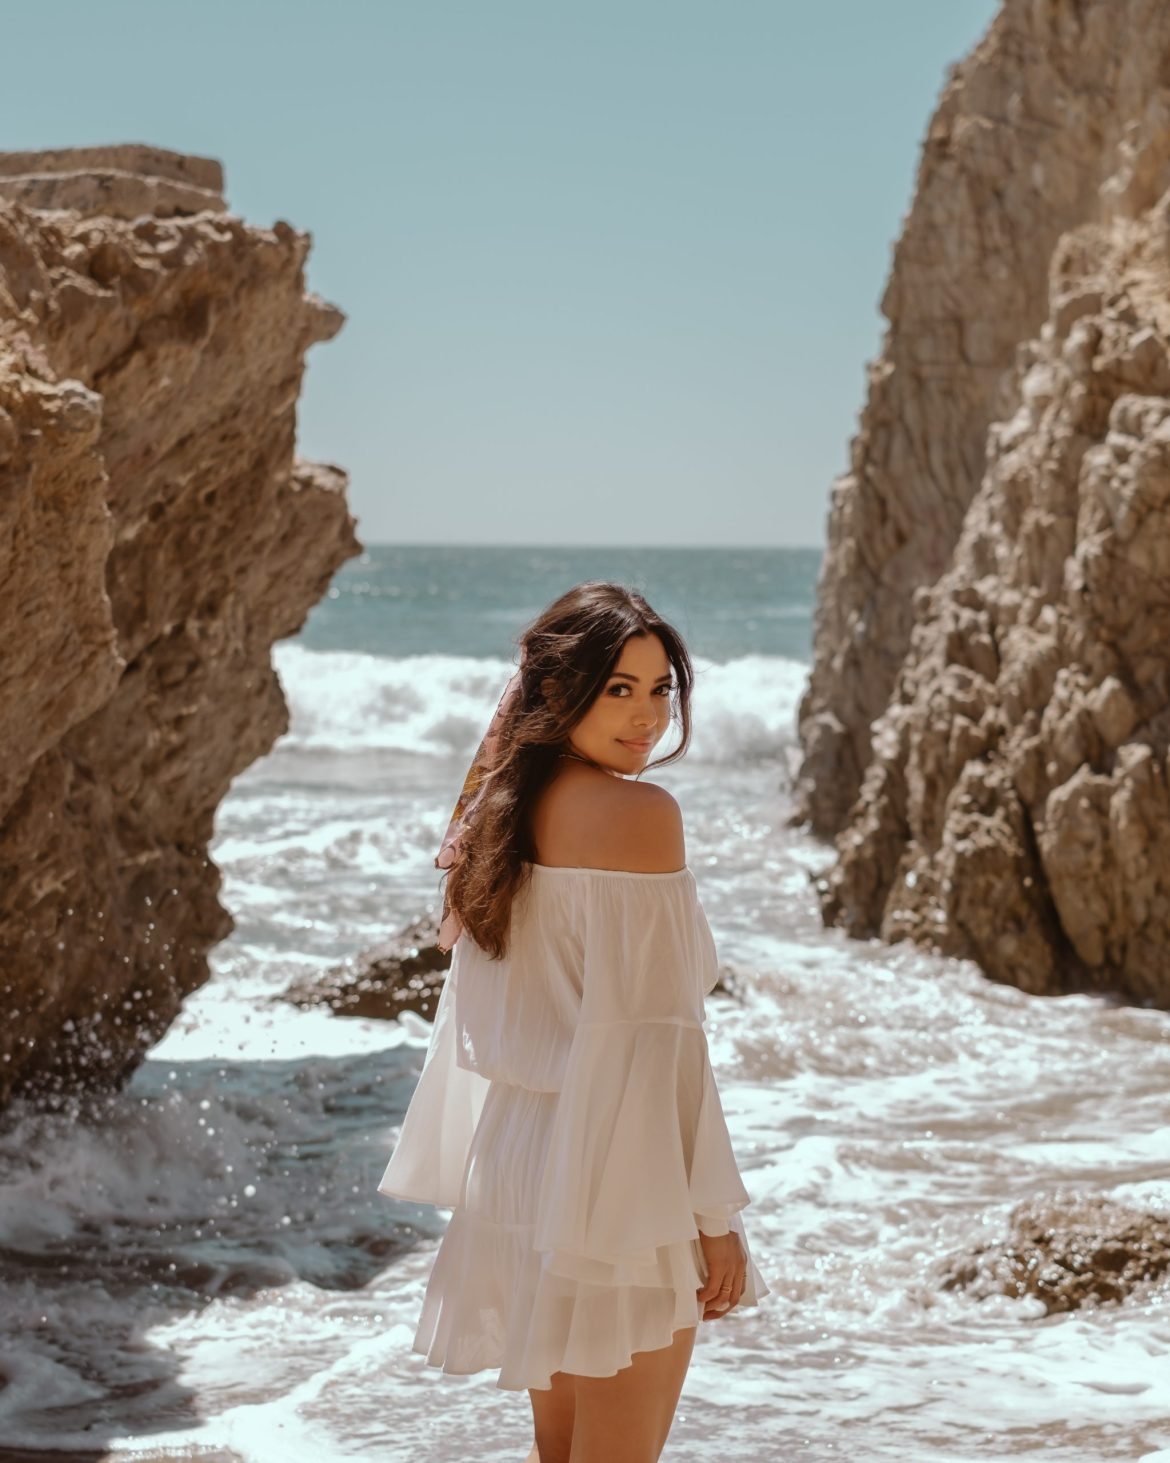 El Matador Beach, Malibu - 16 places to to visit in California